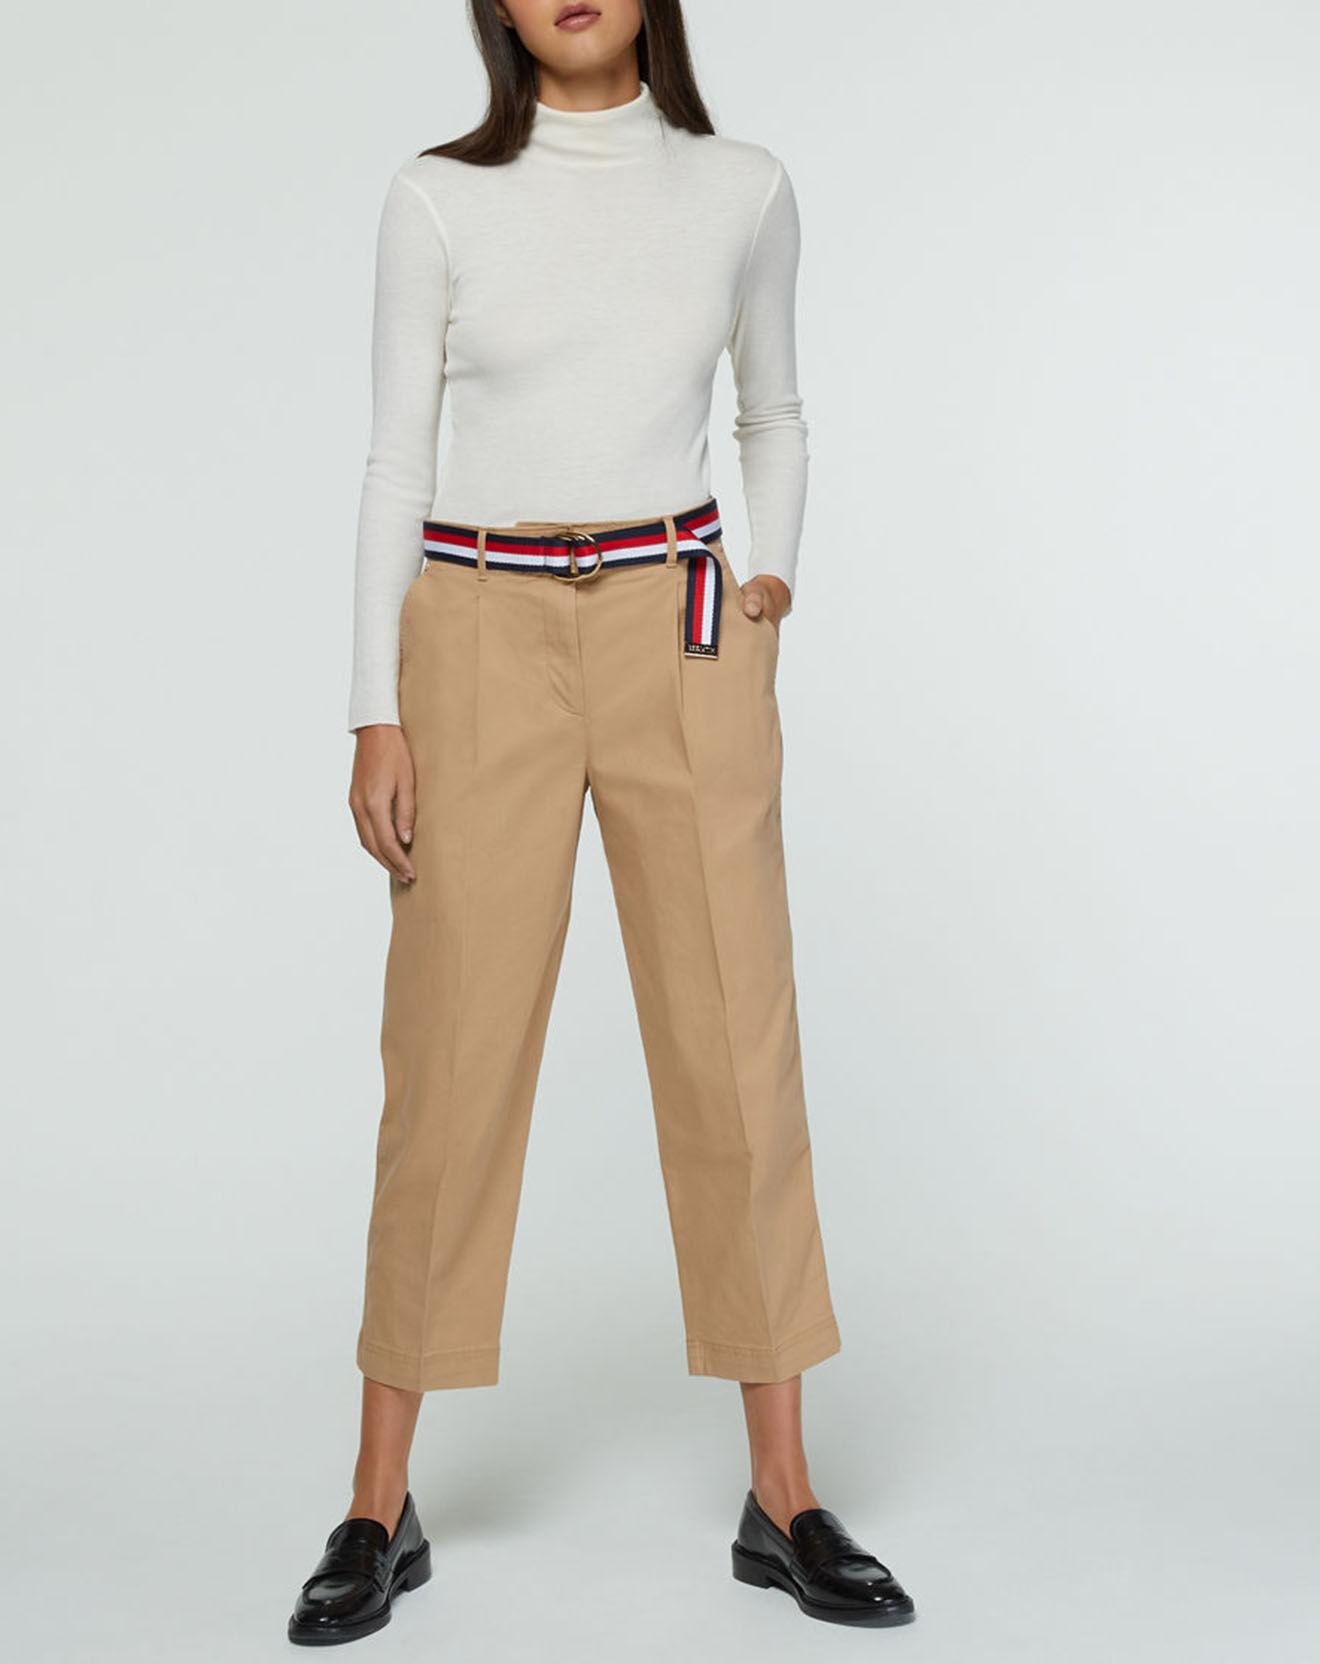 Pantalon chino droit beige - Tommy Hilfiger - Modalova